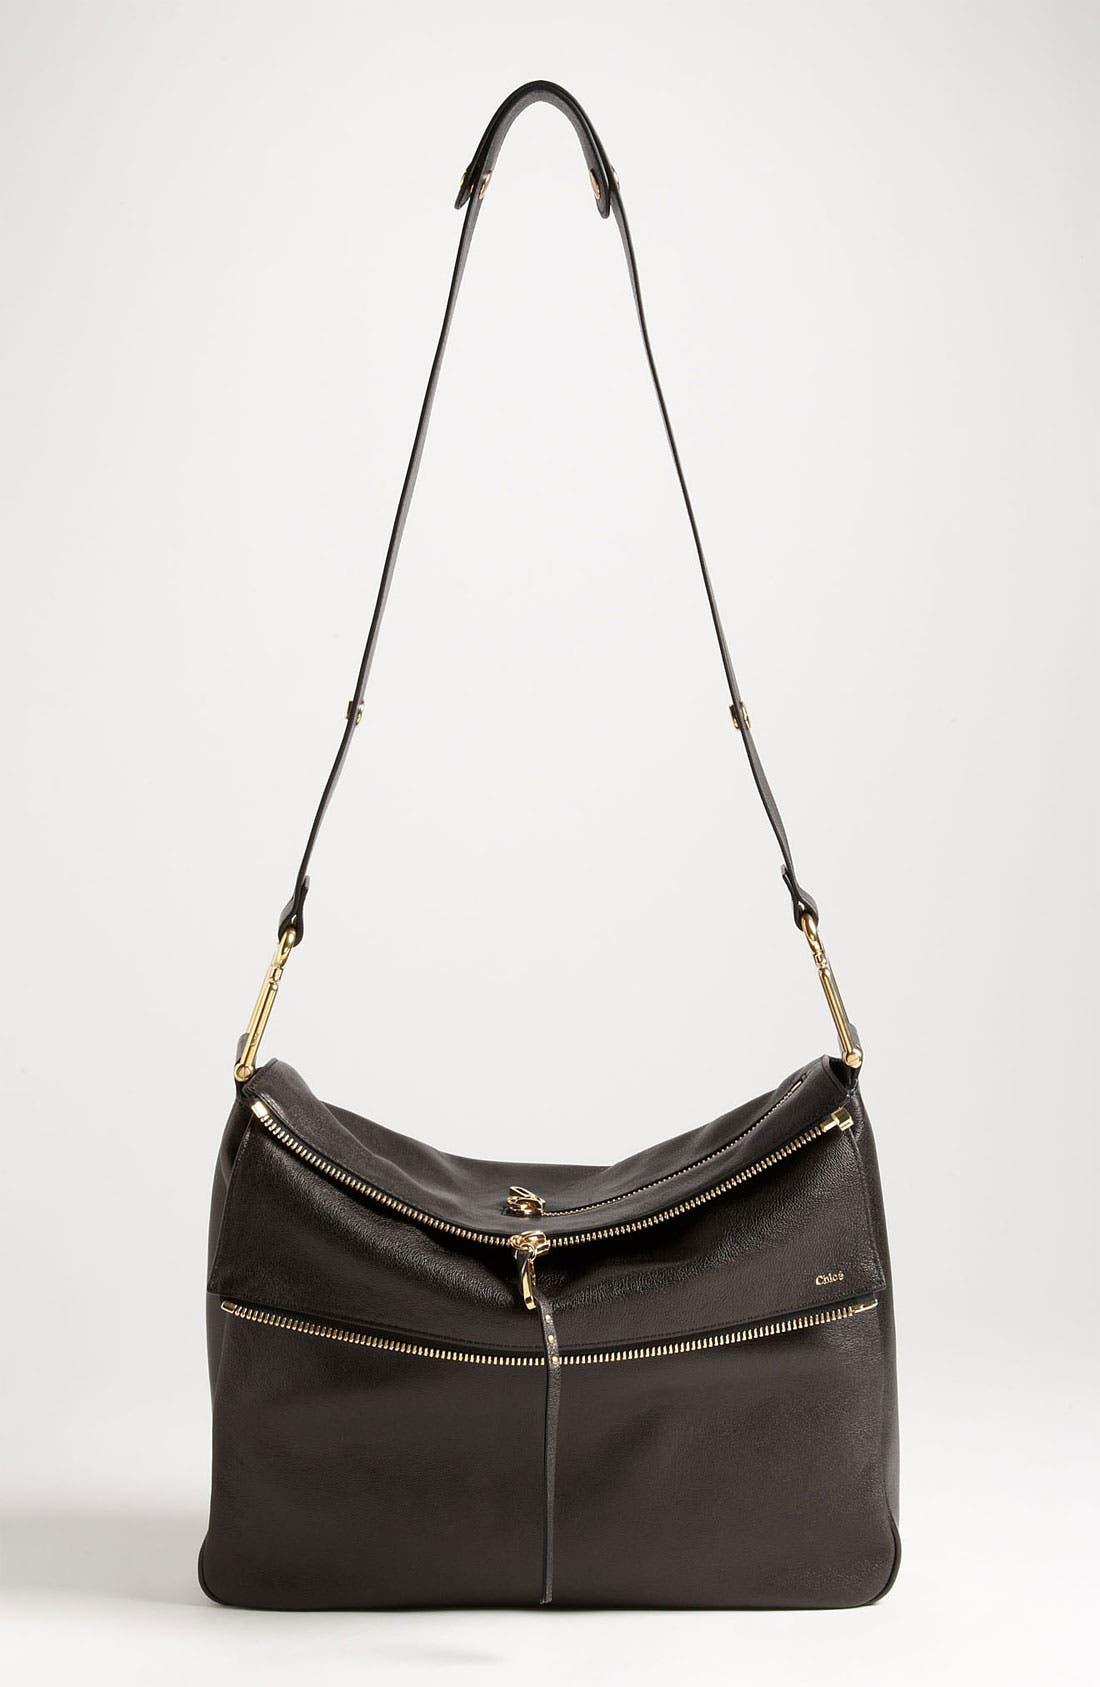 Alternate Image 1 Selected - Chloé 'Vanessa - Medium' Crossbody Bag